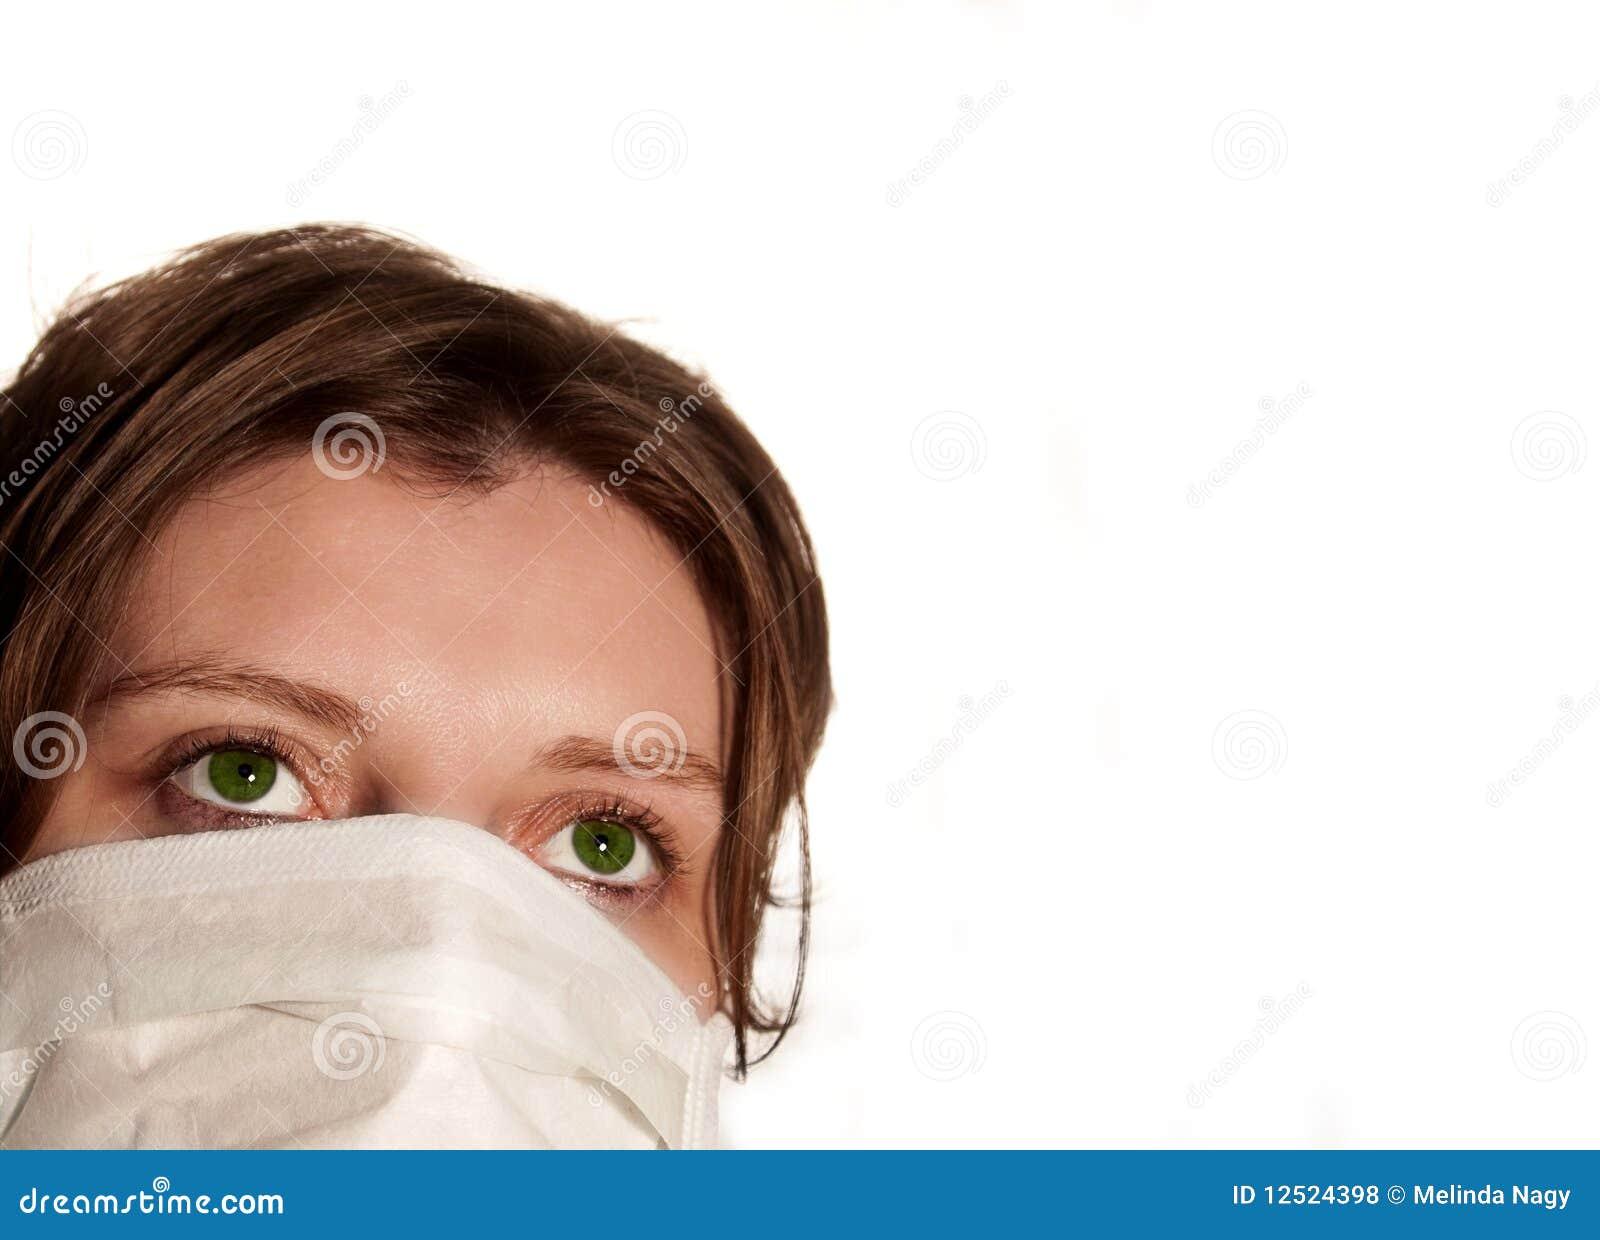 masque yeux virus